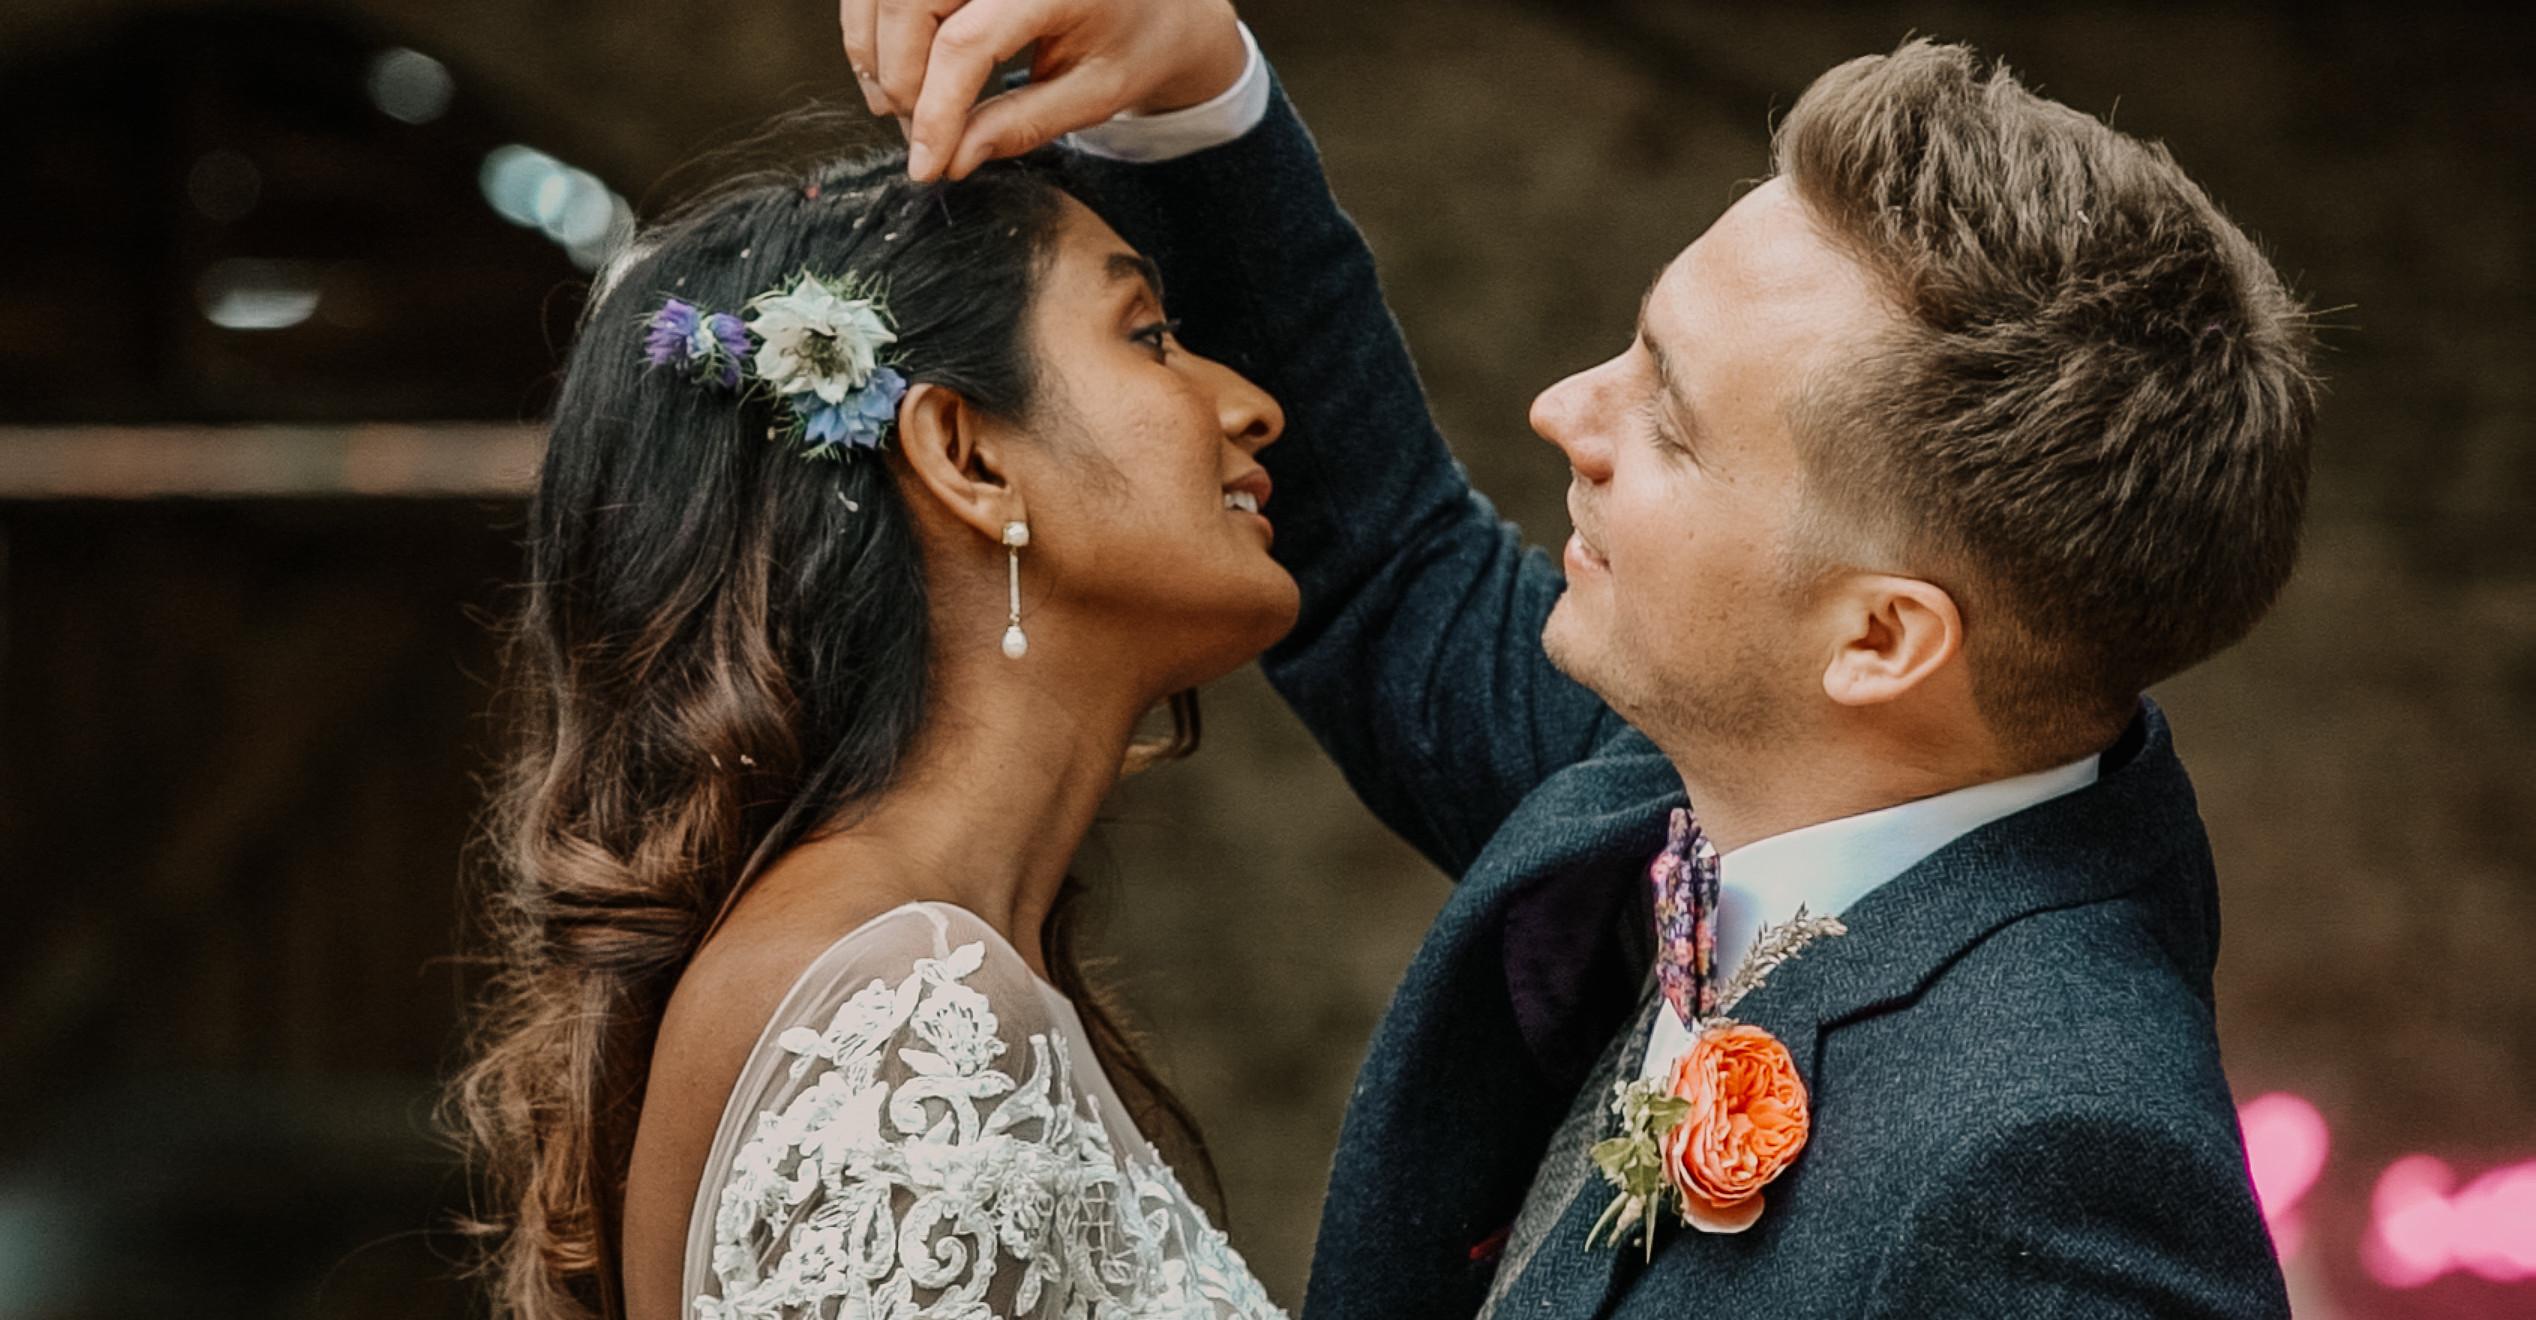 Alternative, boho Bride and Groom